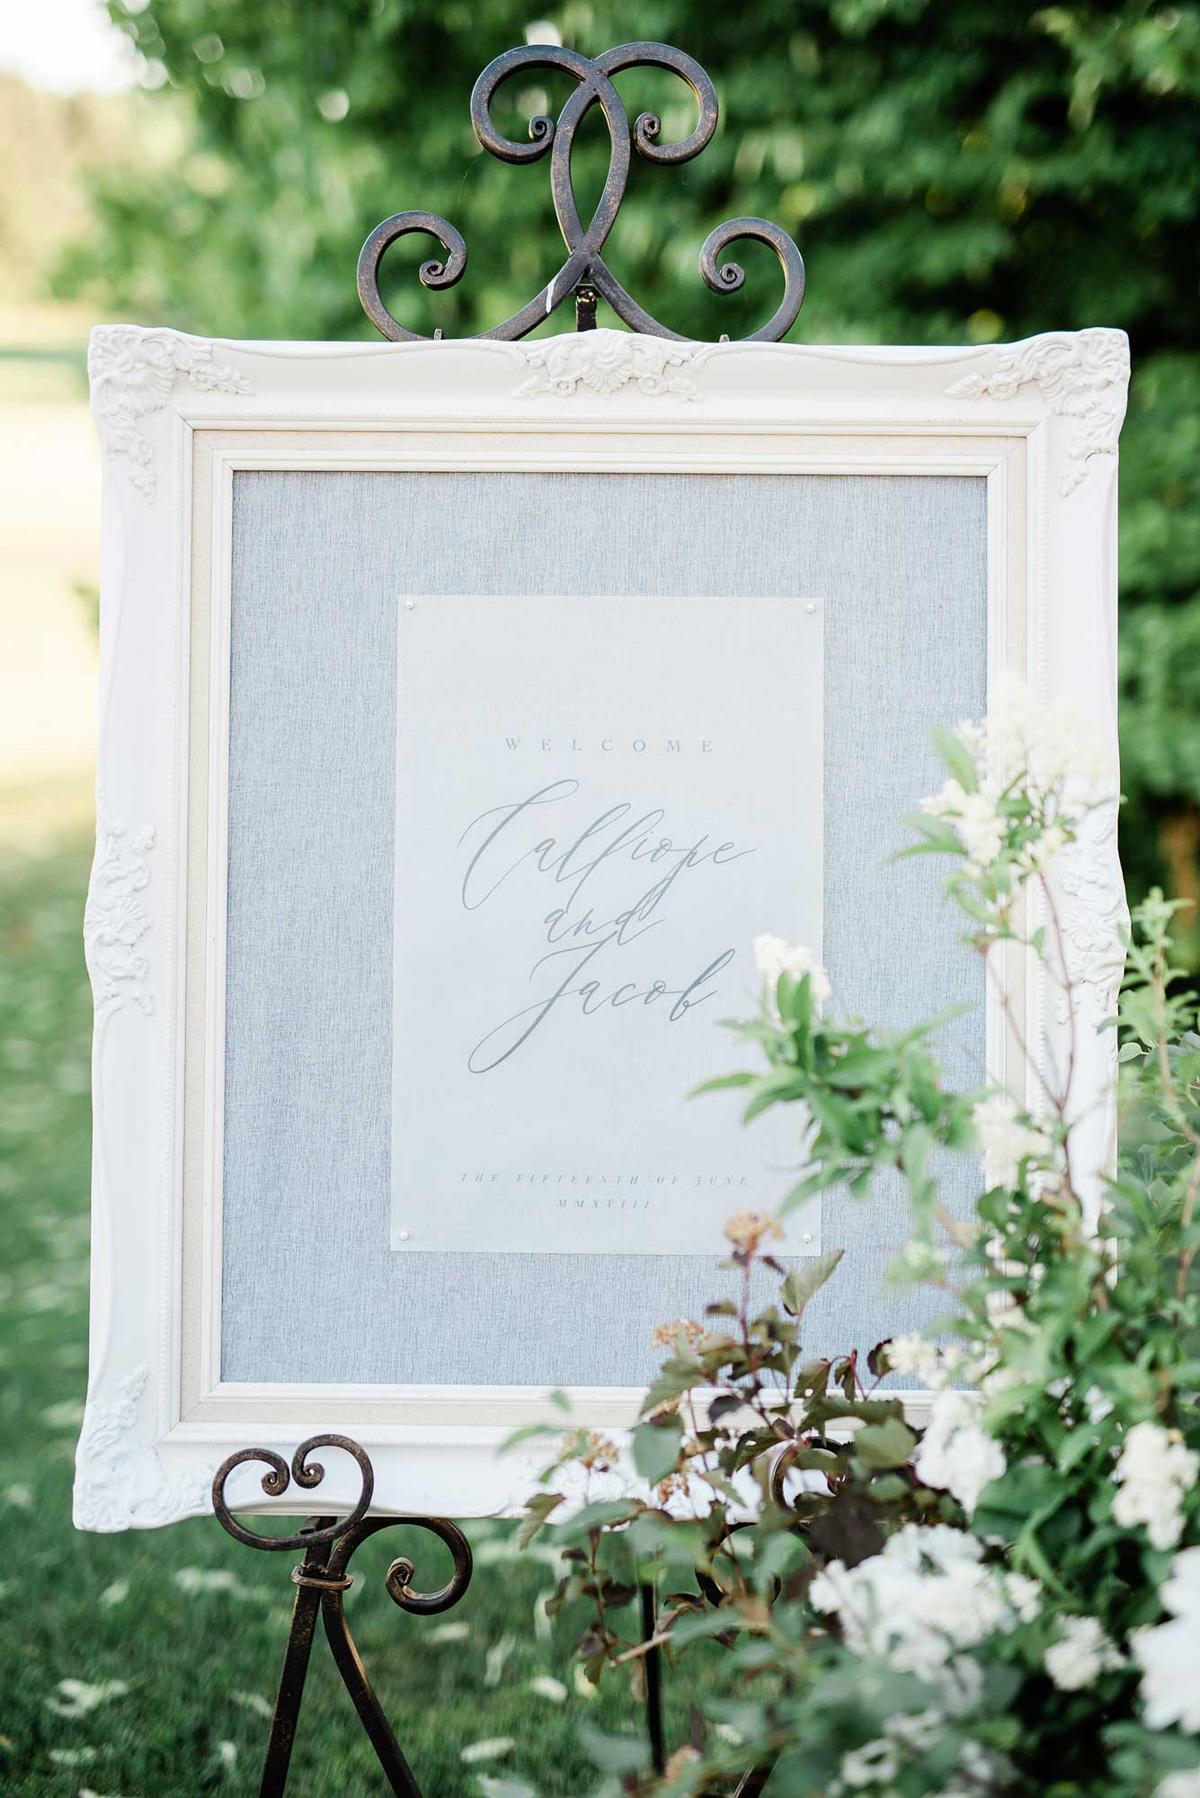 destiny-dawn-photography-vineyard-bride-swish-list-knollwood-golf-and-country-club-ancaster-wedding-editorial-32.jpg